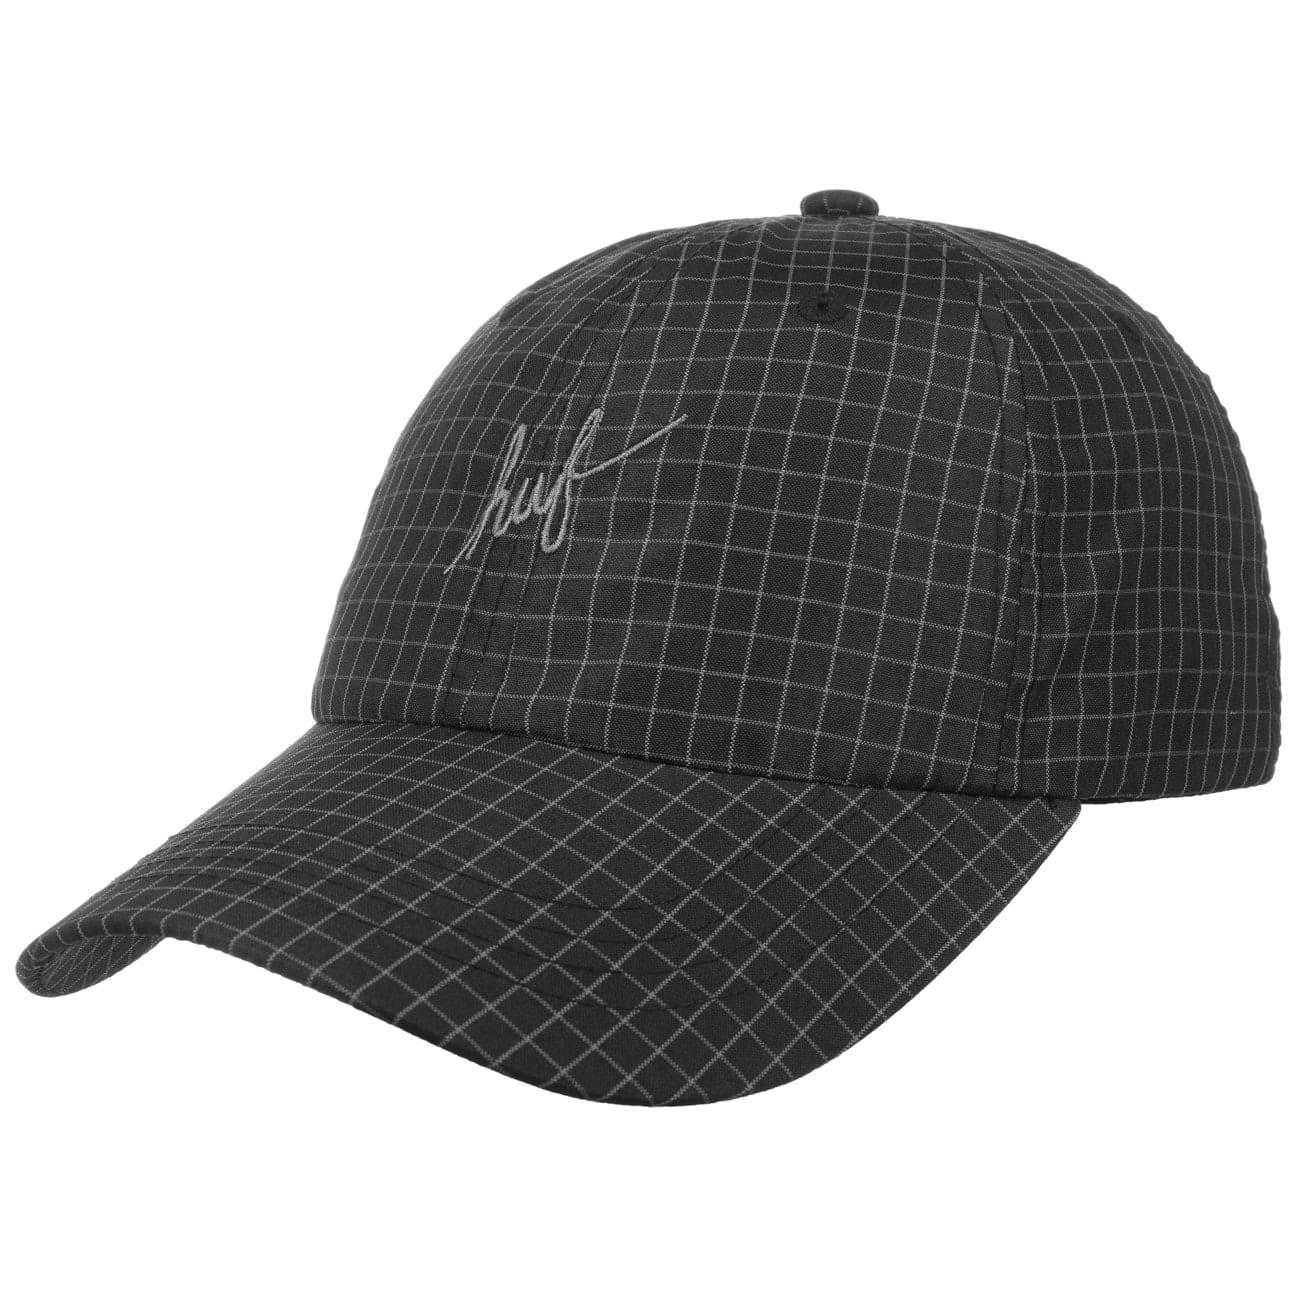 curved-flynn-strapback-cap-by-huf-basecap